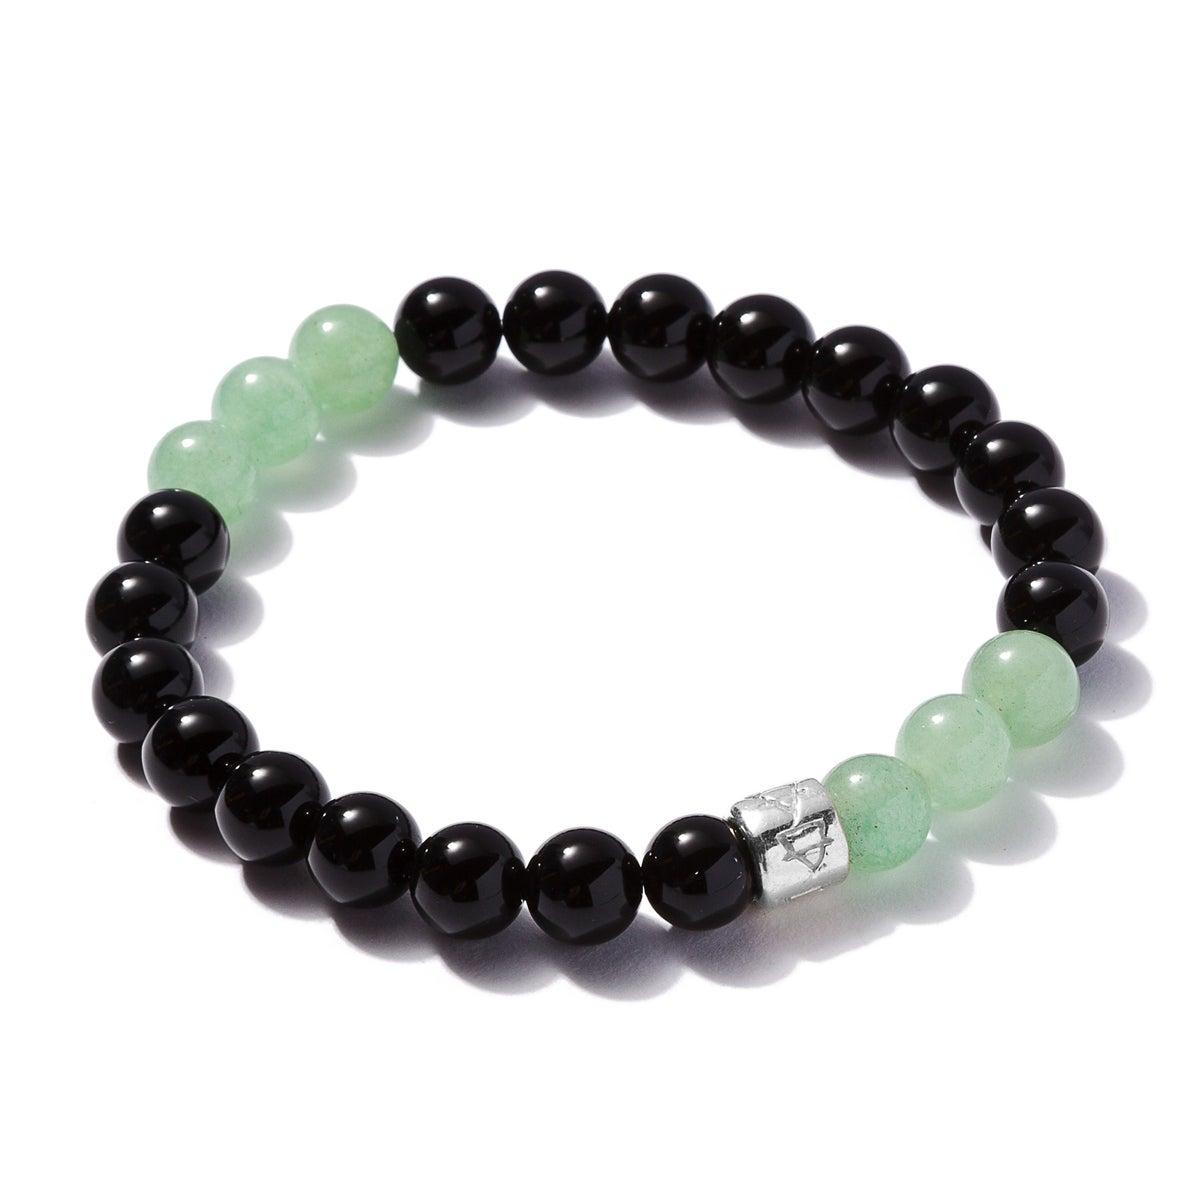 Image of Black Onyx with 6 Aventurine Beads